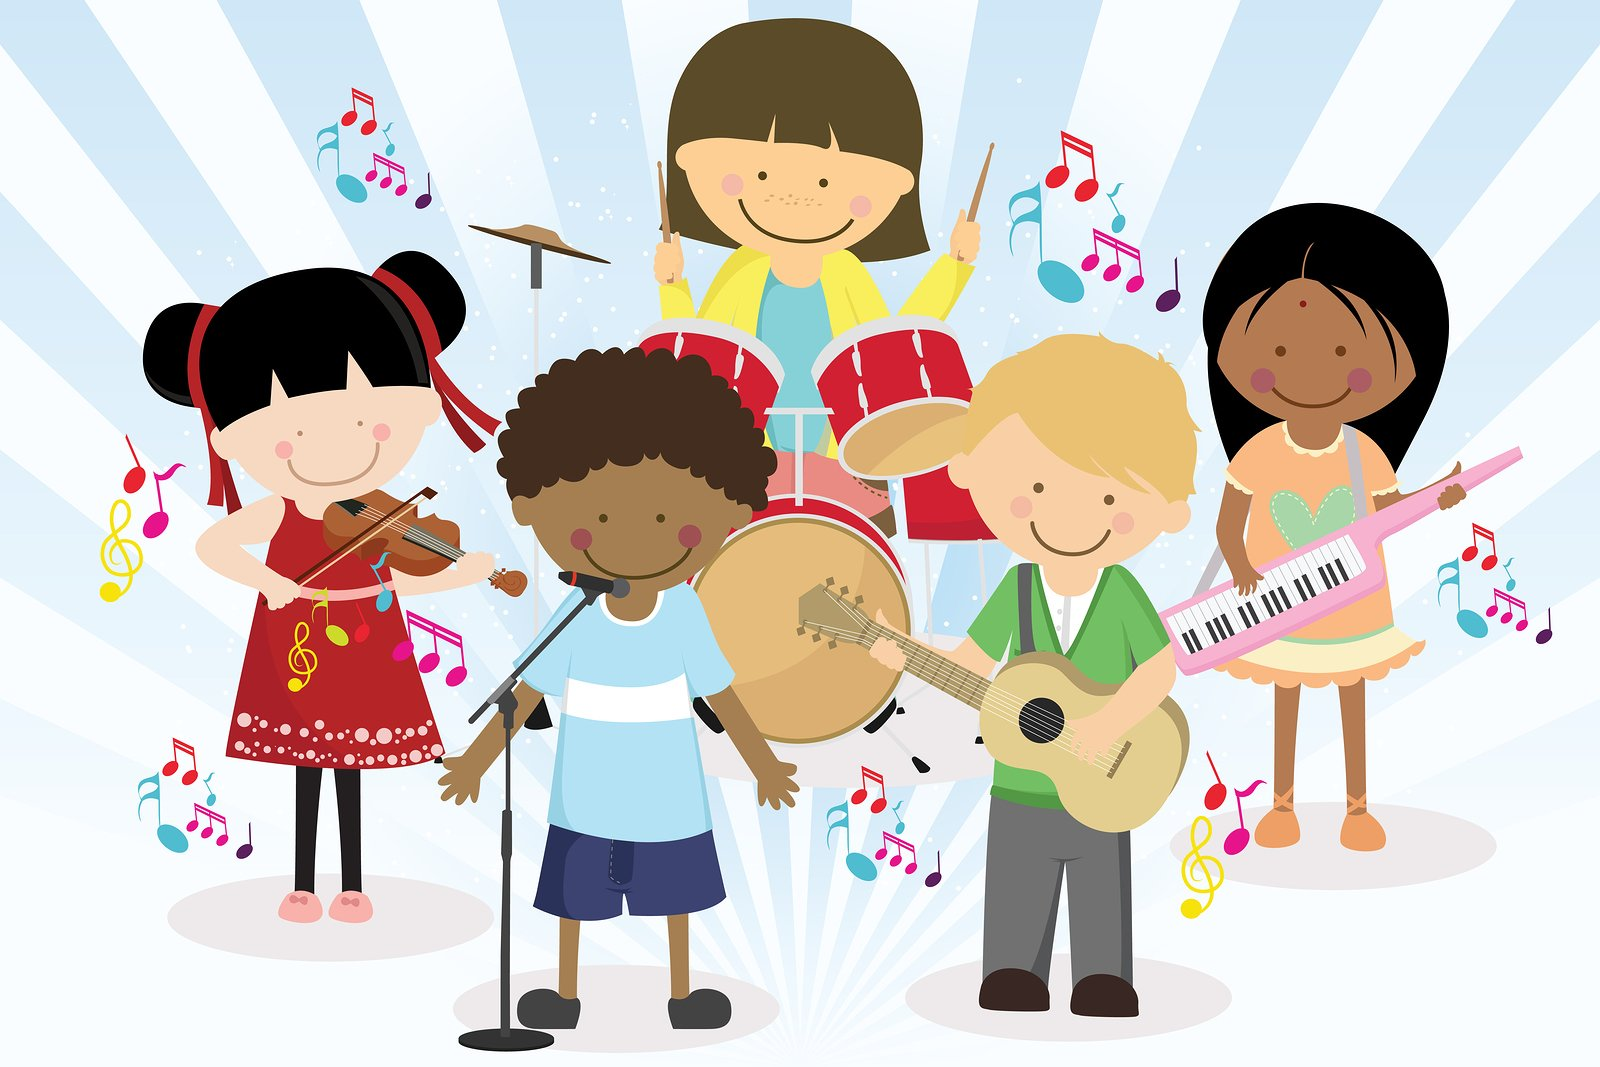 bigstock-Music-Band-Of-Four-Little-Kids-15116387